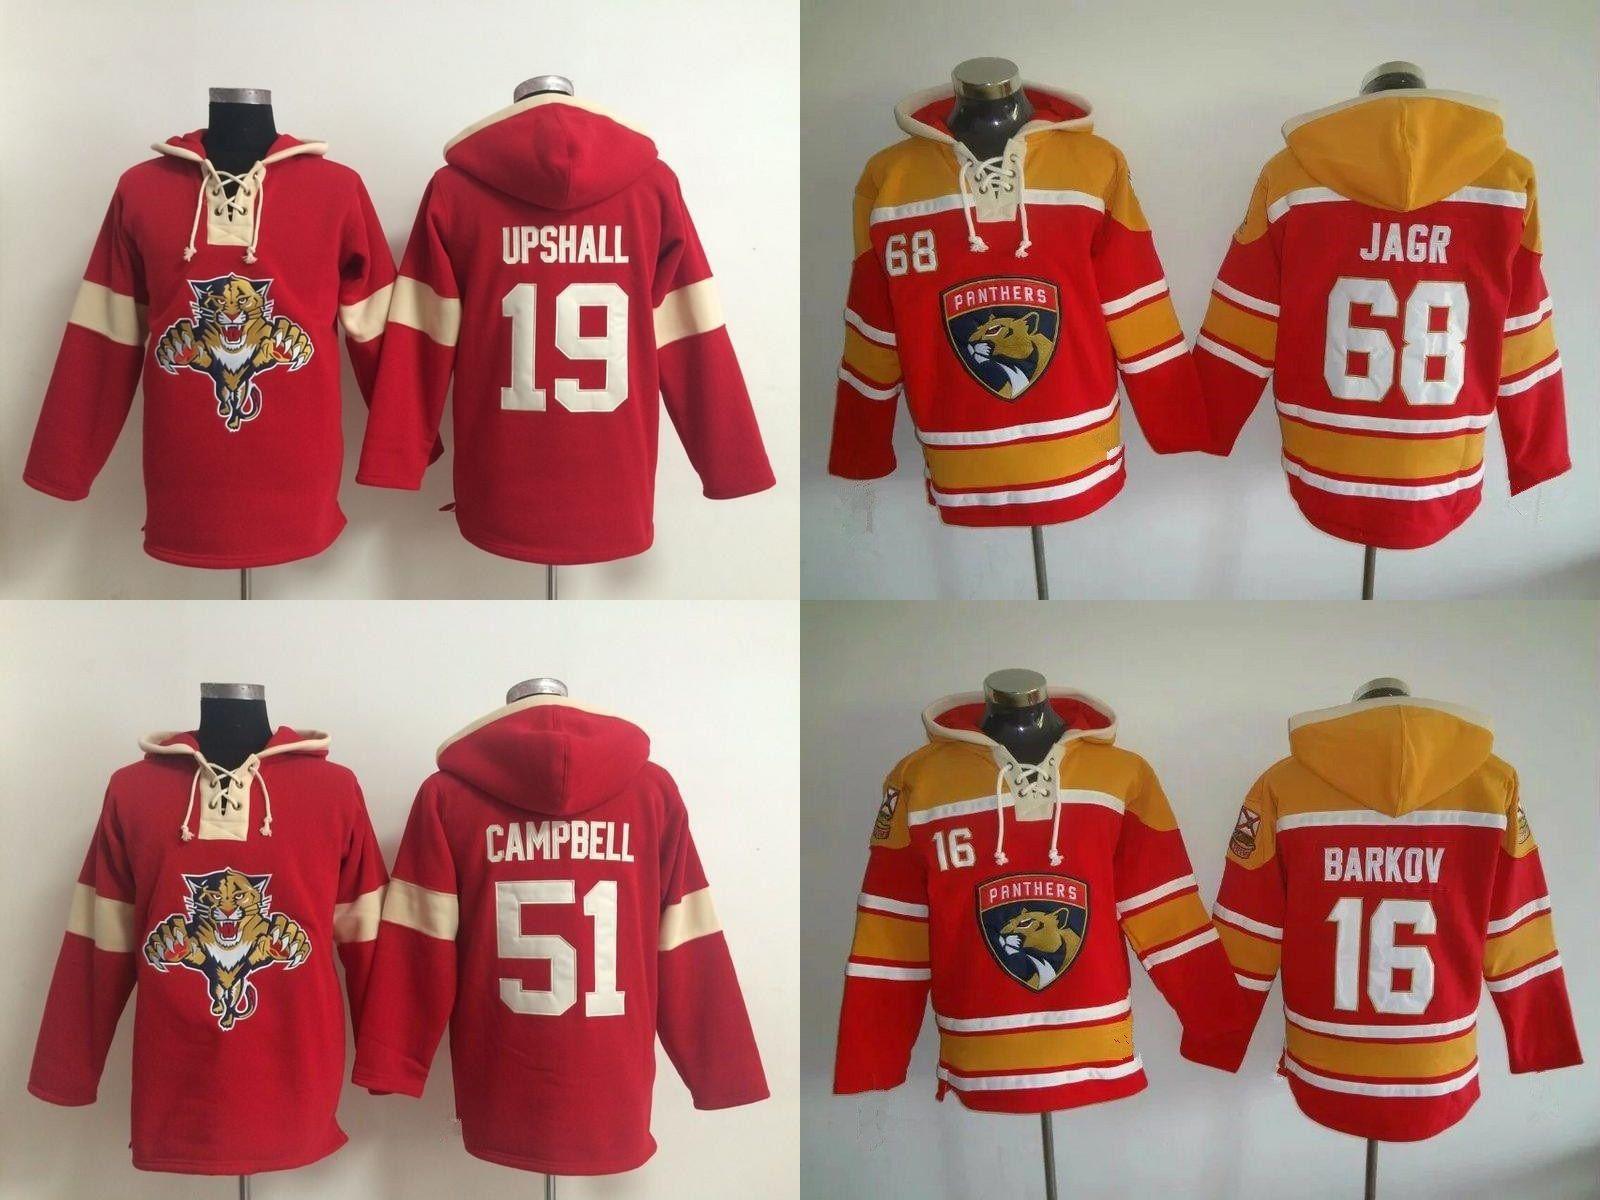 32bf3ae10 2019 Hot Sale Mens Womens Kids Florida Panthers 16 Aleksander Barkov 19  Scottie Upshall 51 Brian Campbell 68 Jaromir Jagr Ice Hockey Hoodies From  Espn_sport ...